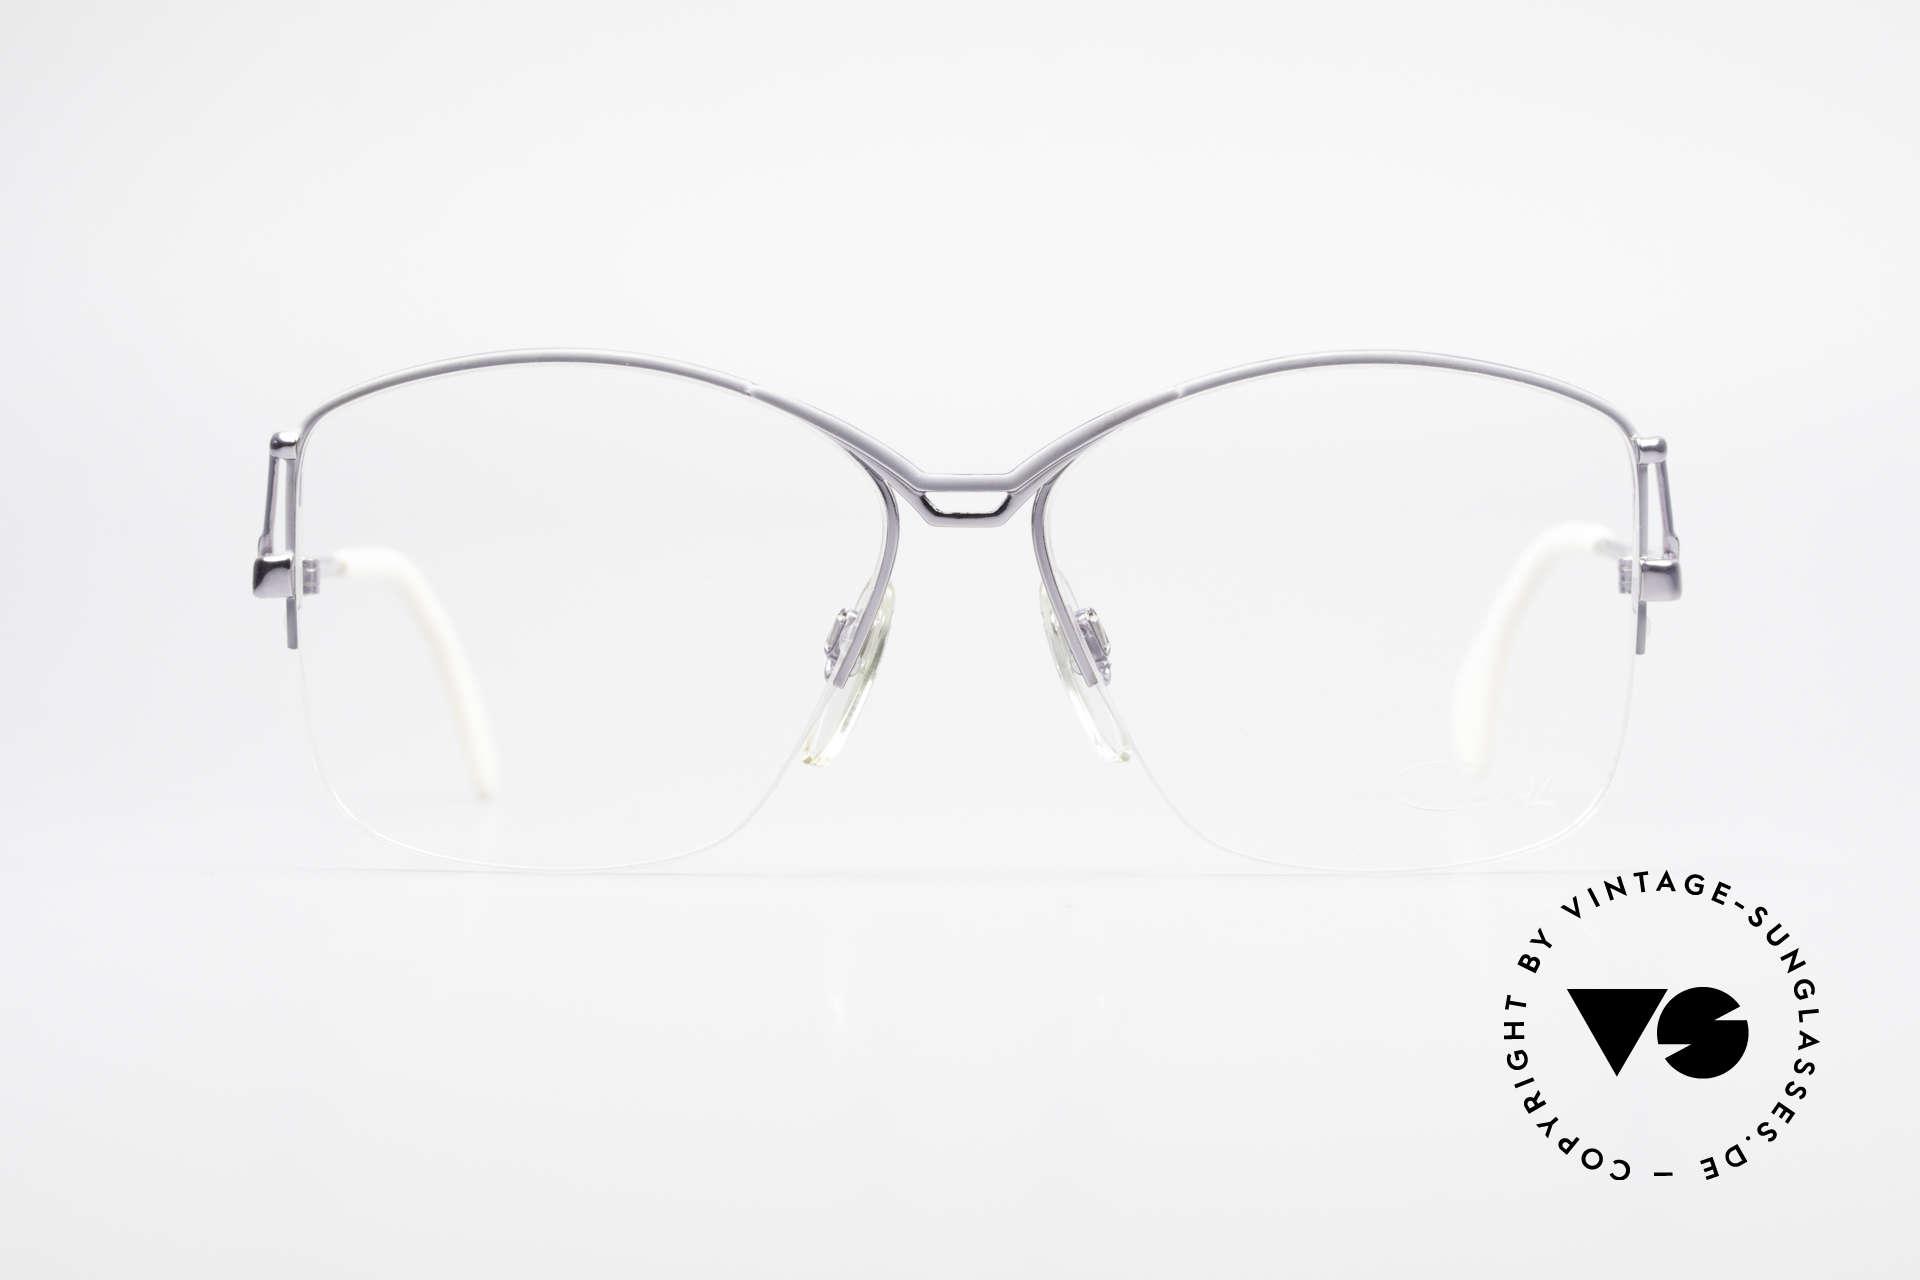 Cazal 222 80's Original No Retro Glasses, half-rimmed spectacles, feminine butterfly-design, Made for Women